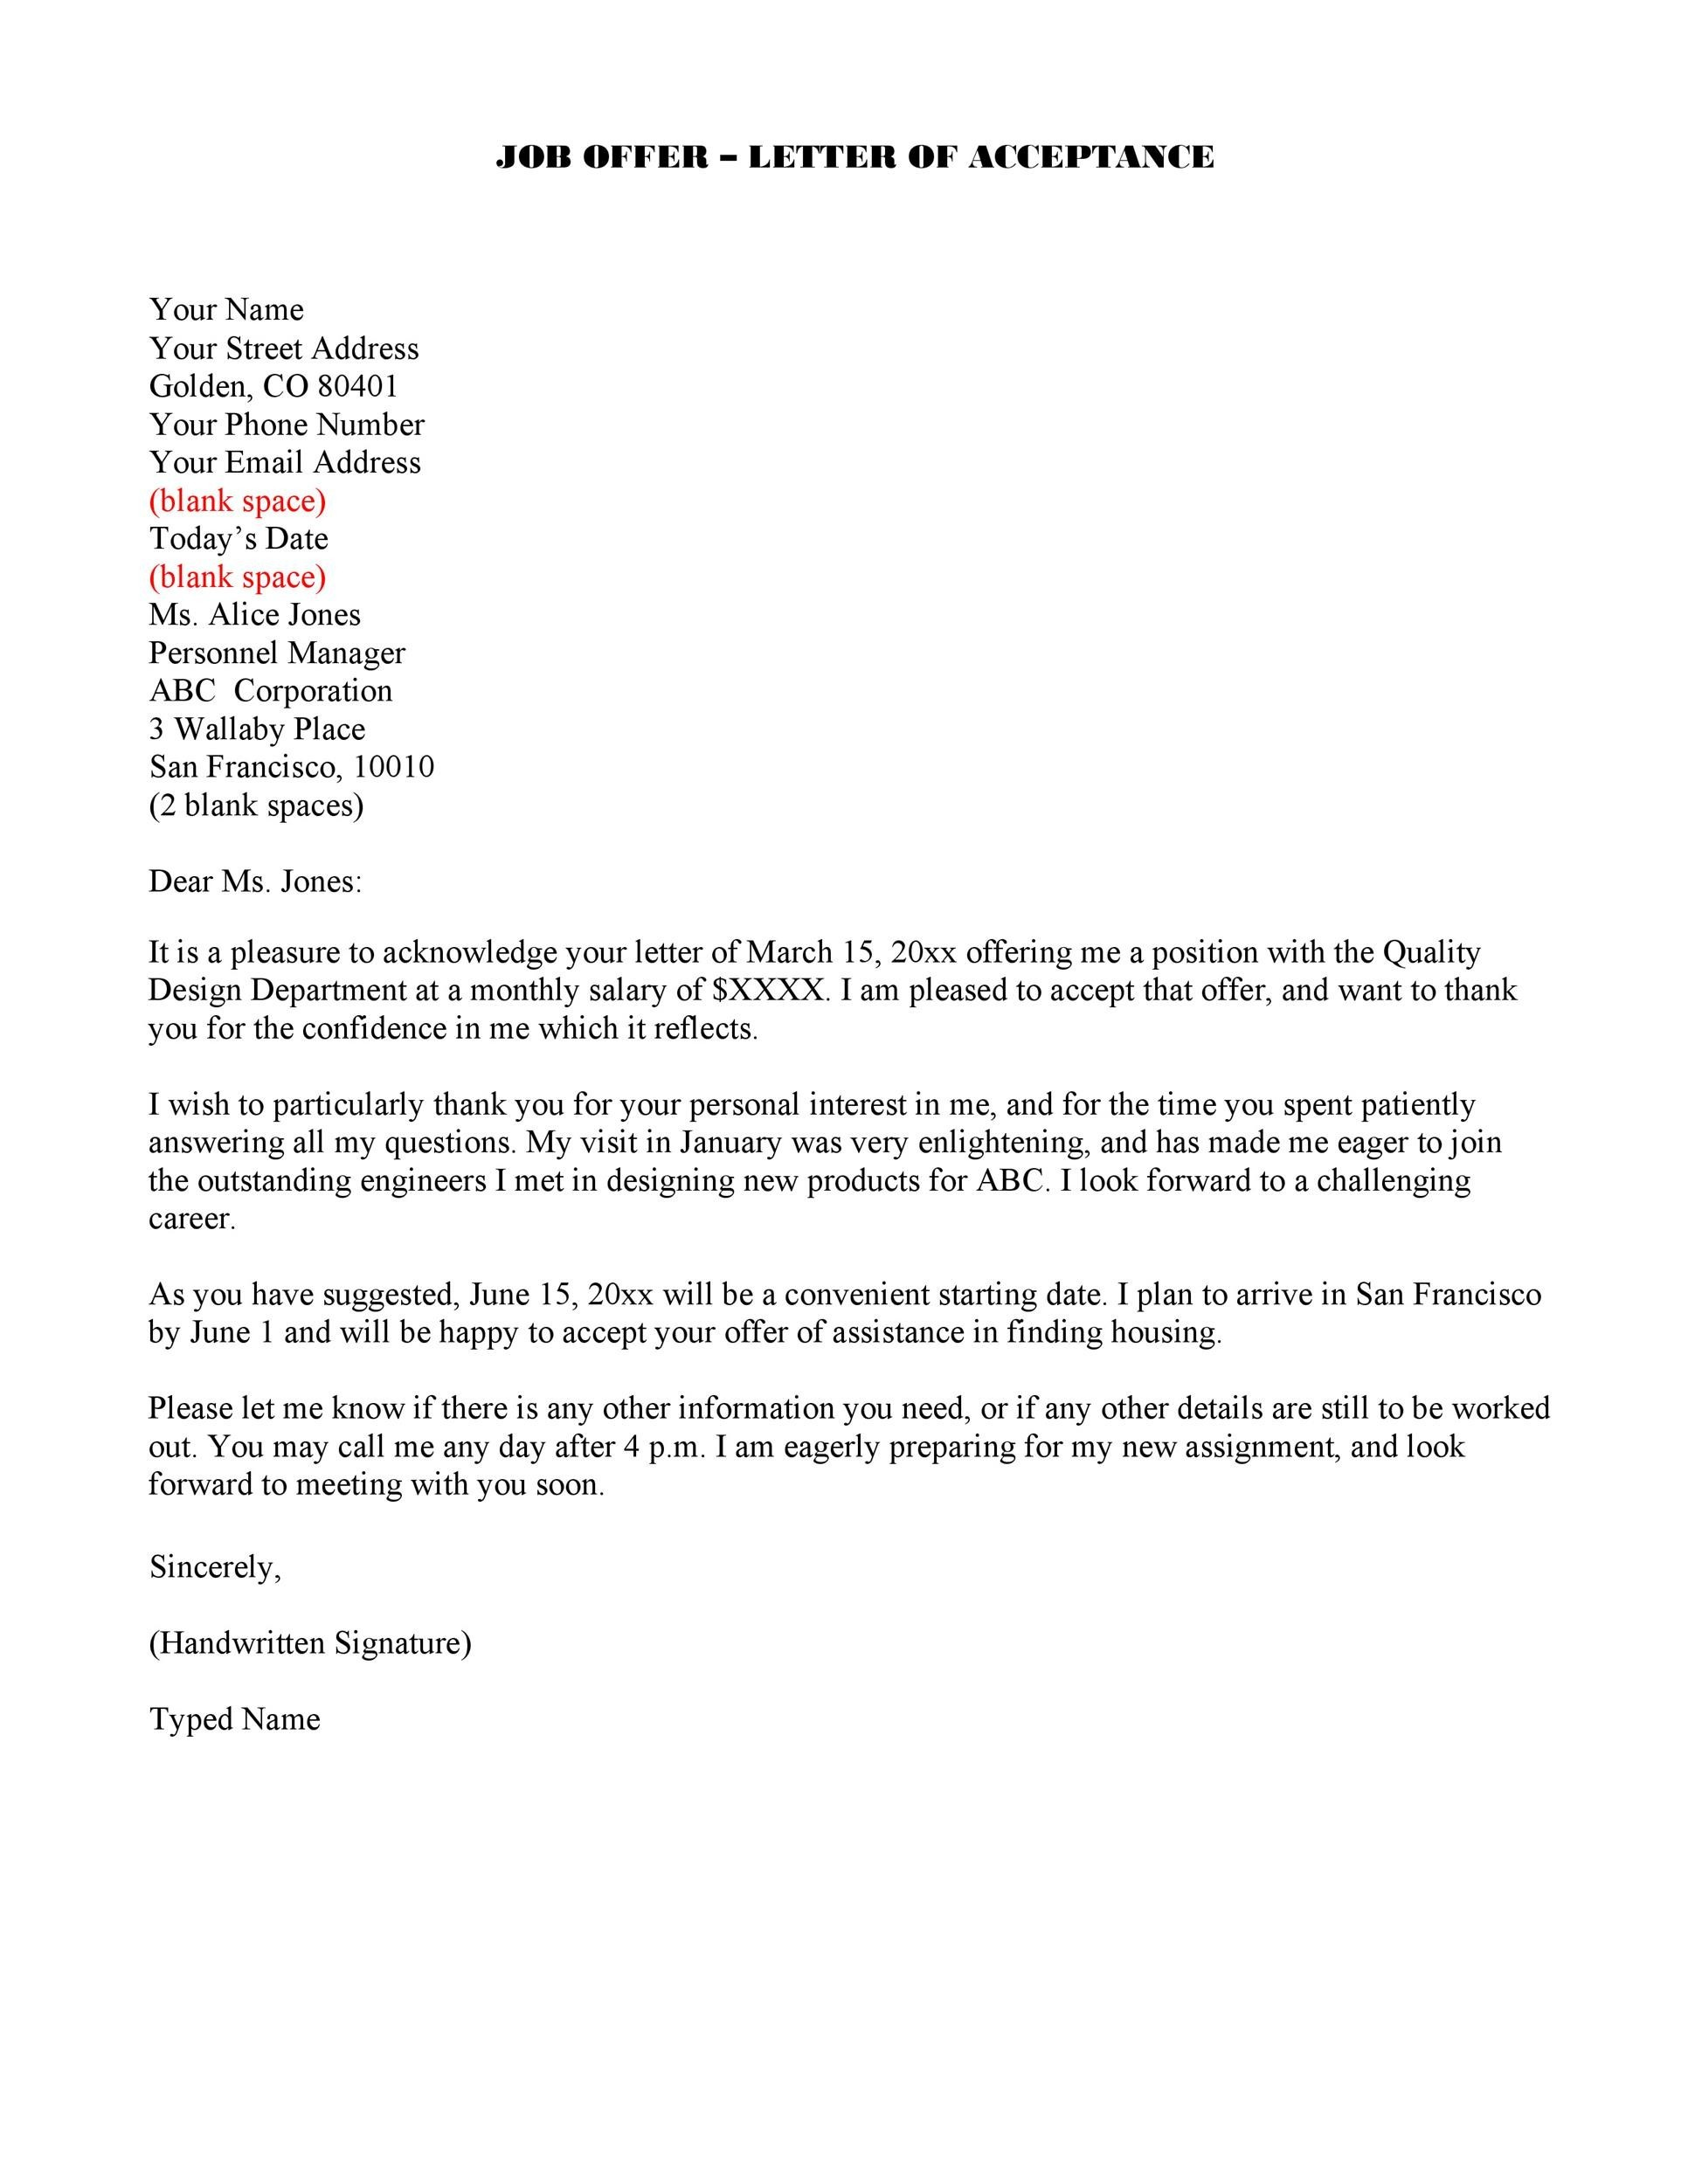 Free job acceptance letter 38